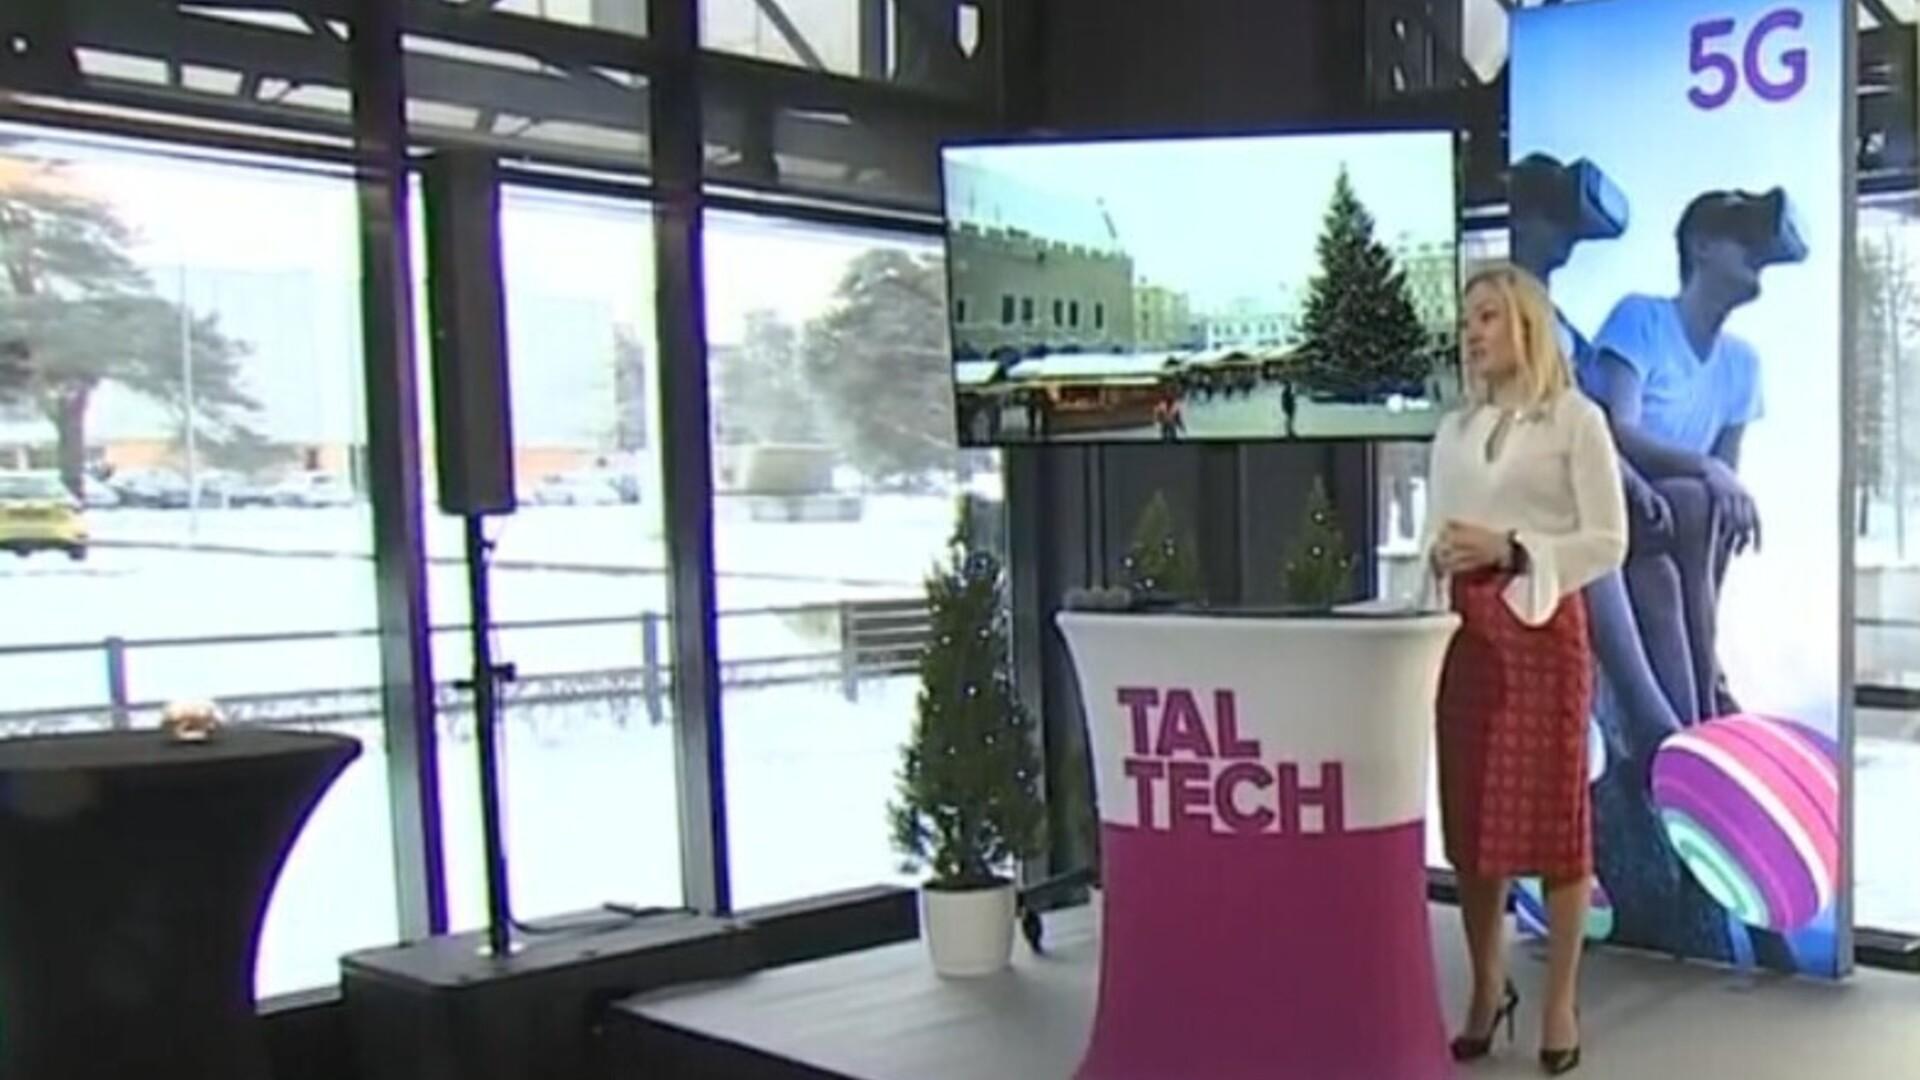 Telia, Ericsson launch 5G pilot network in Tallinn | News | ERR